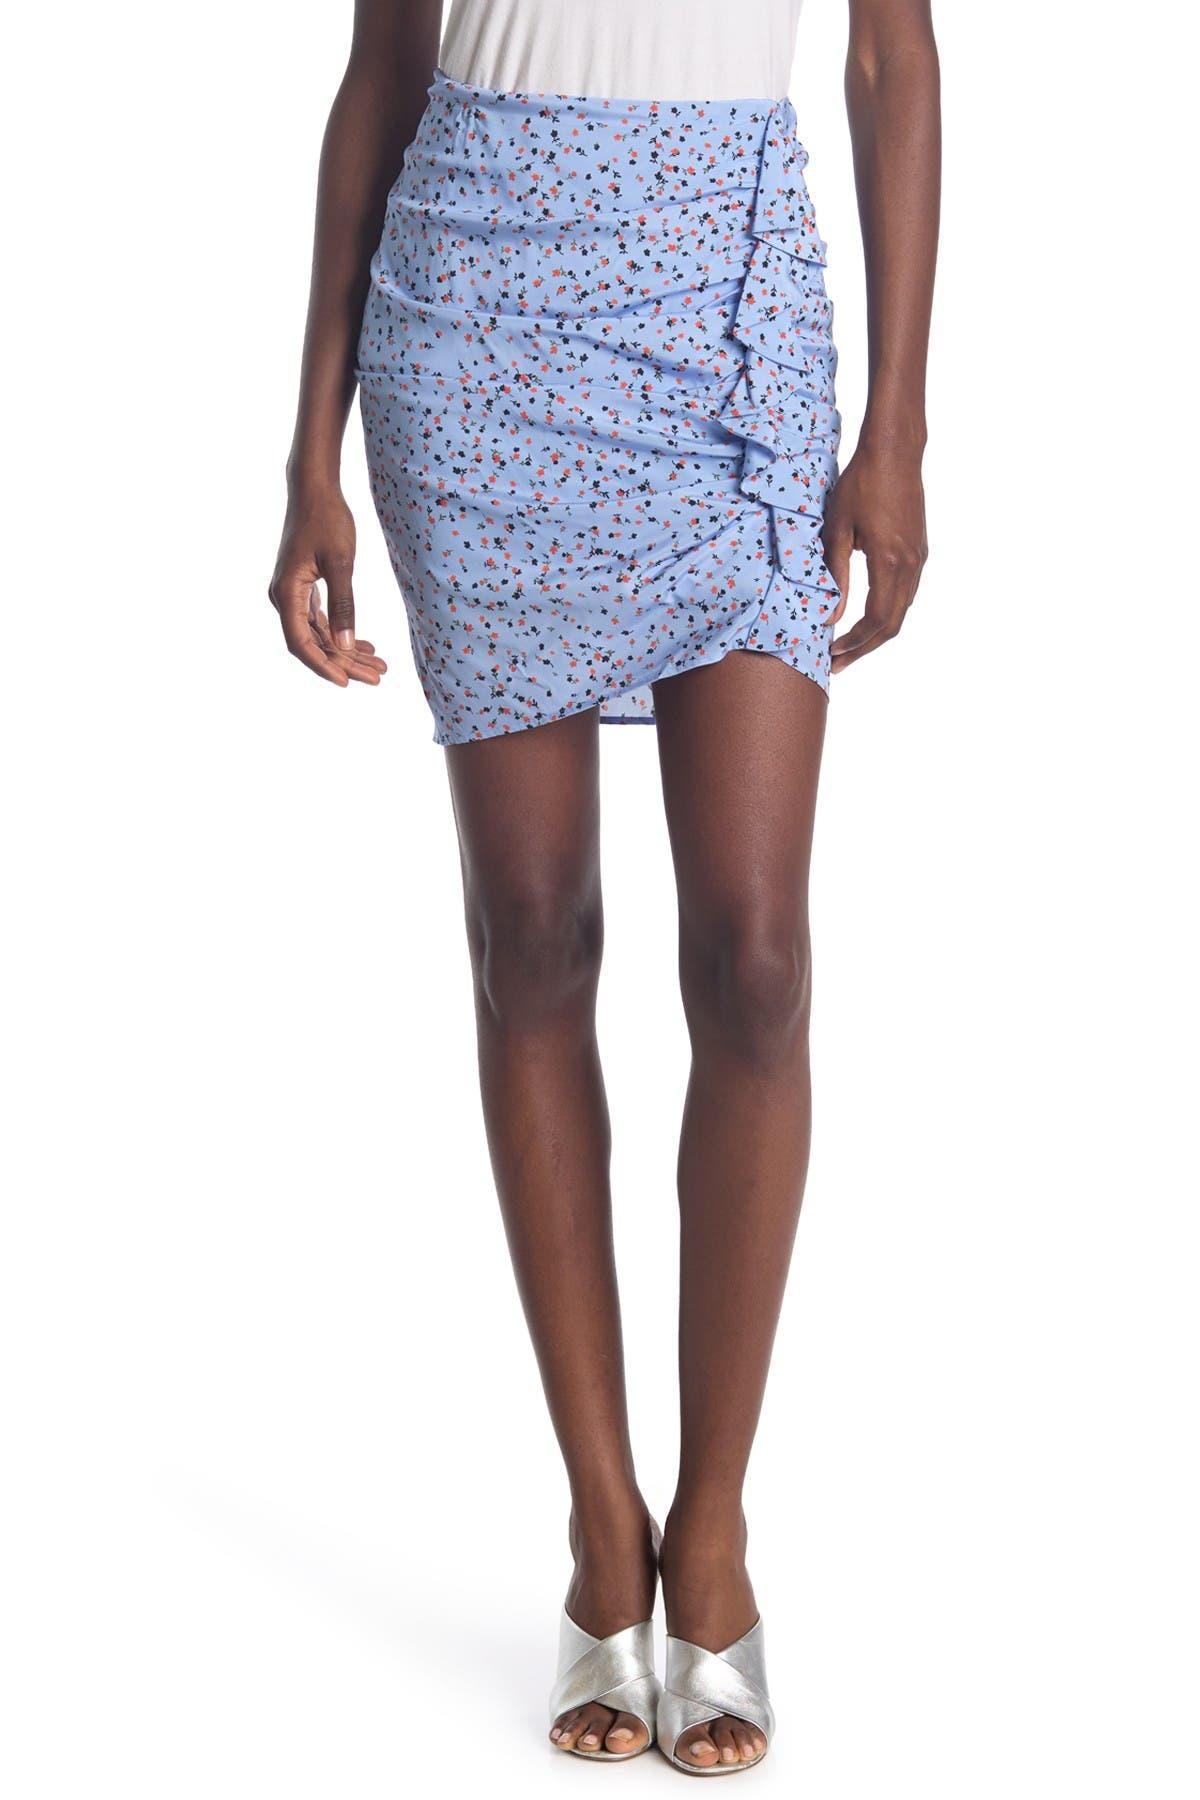 Image of VERONICA BEARD Spencer Floral Print Ruffle Skirt